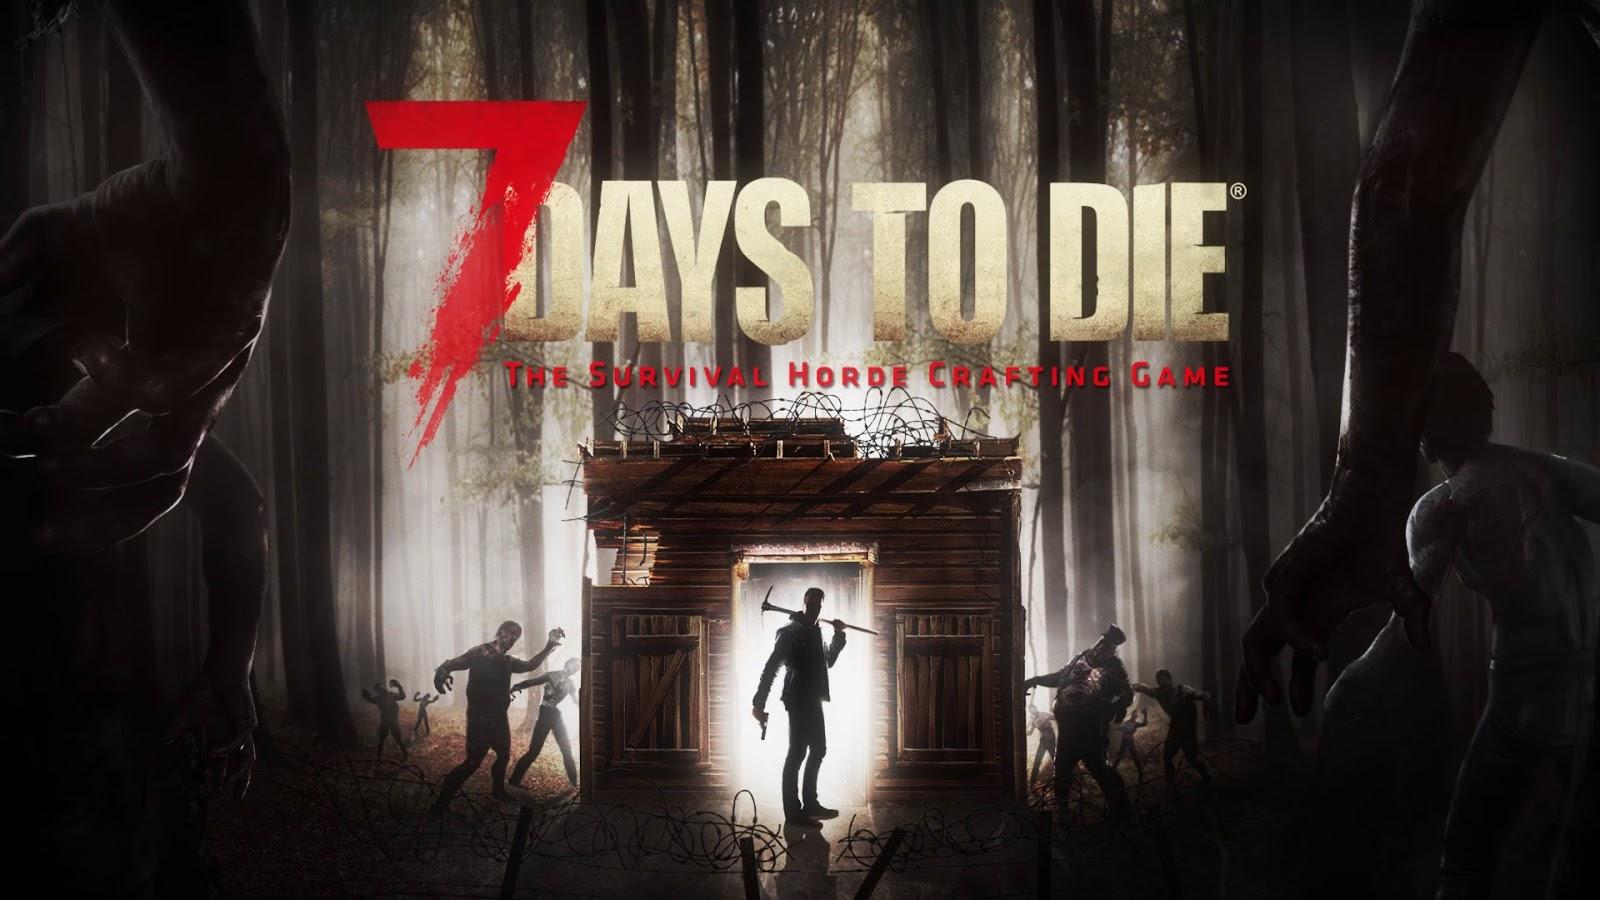 Link Tải Game 7 Days To Die Chơi Online Miễn Phí